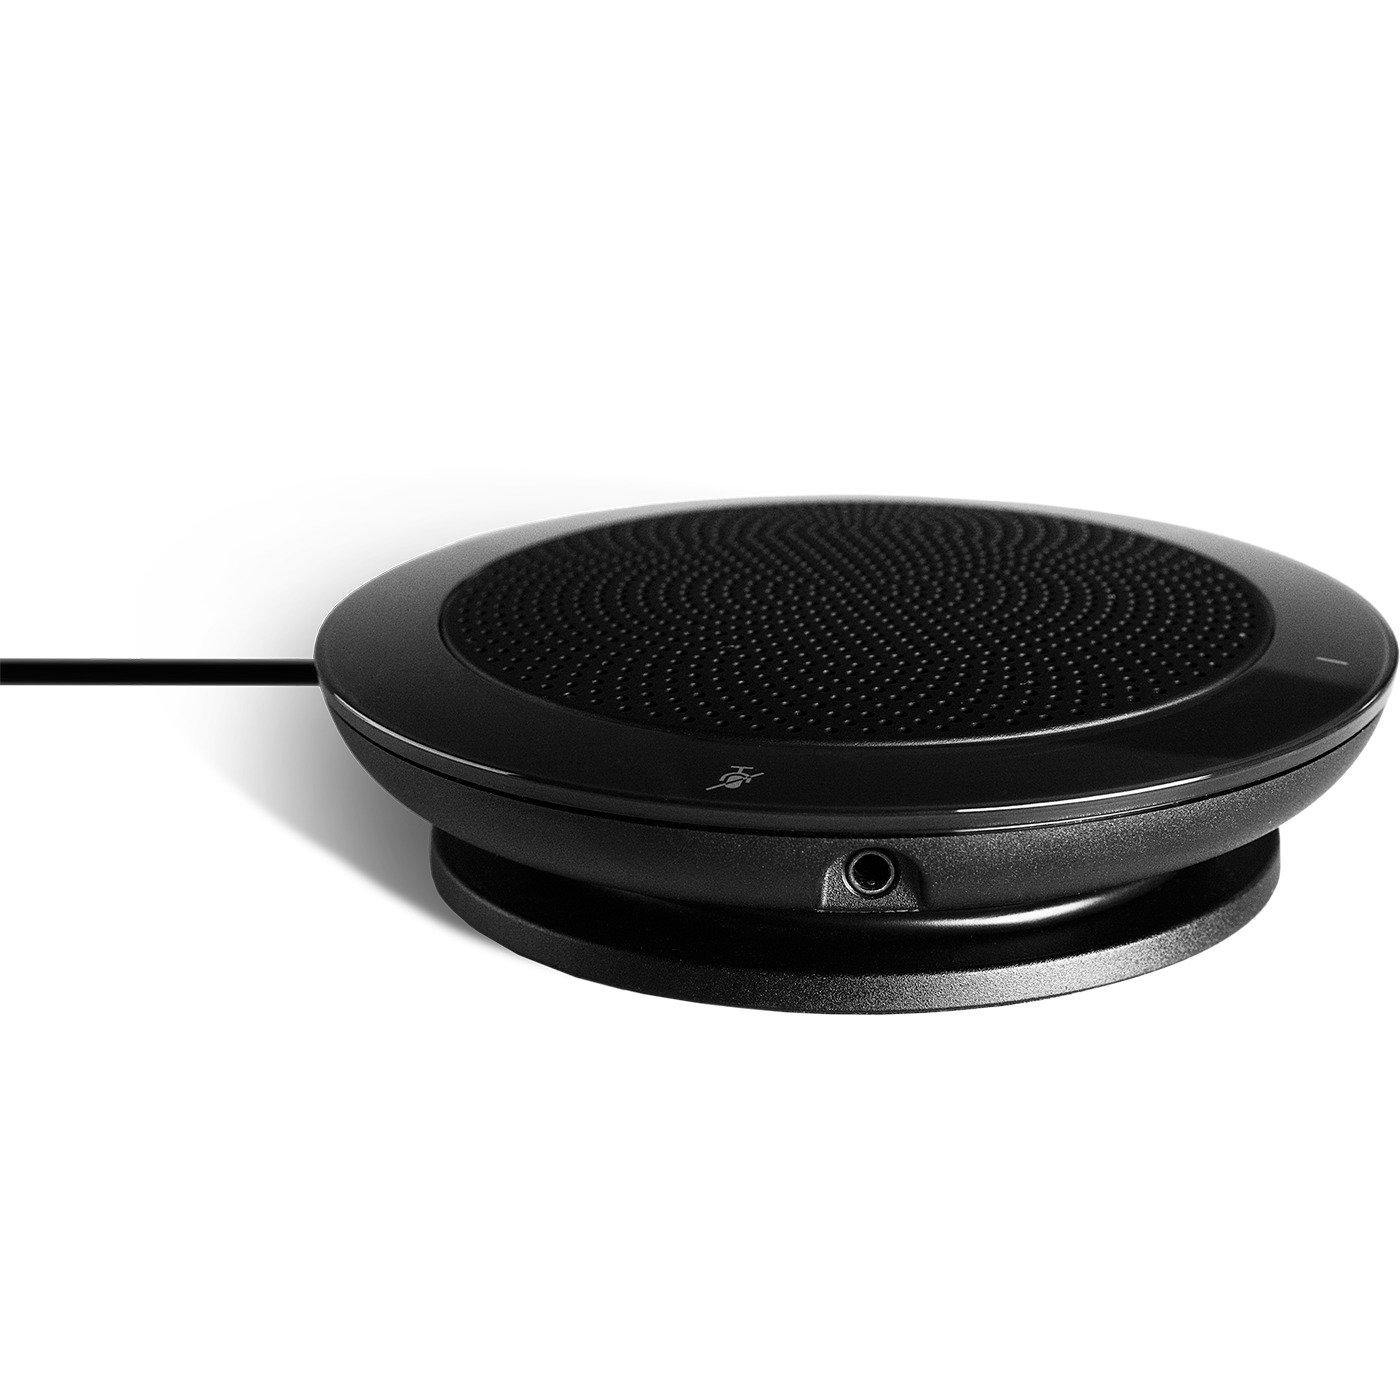 Jabra Speak Wireless Bluetooth Speaker & Speakerphone